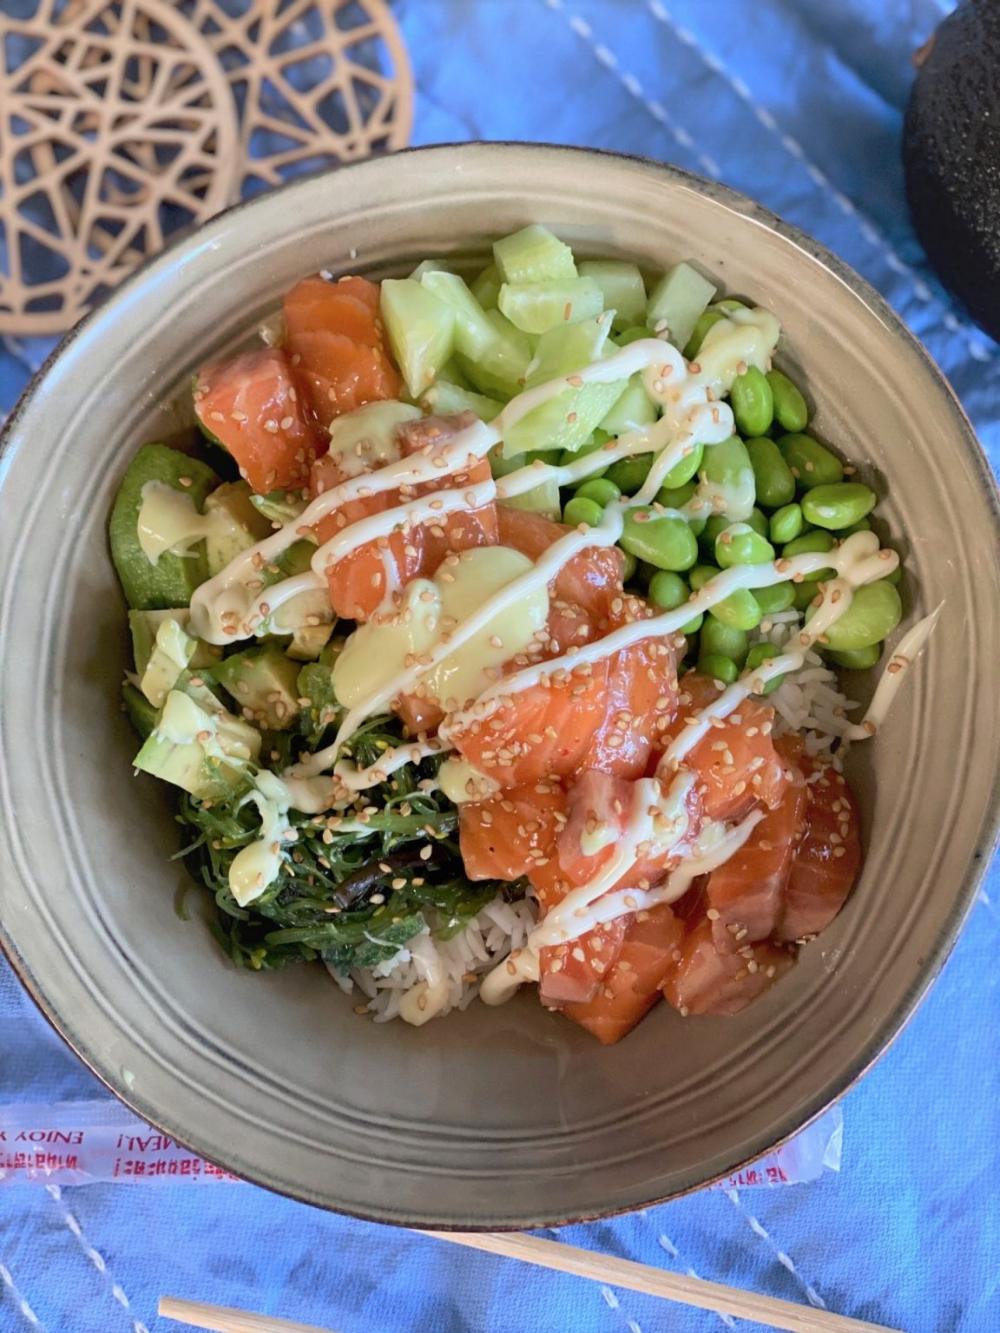 Spicy zalm poke bowl met gemengde groente - Foodblog Foodinista